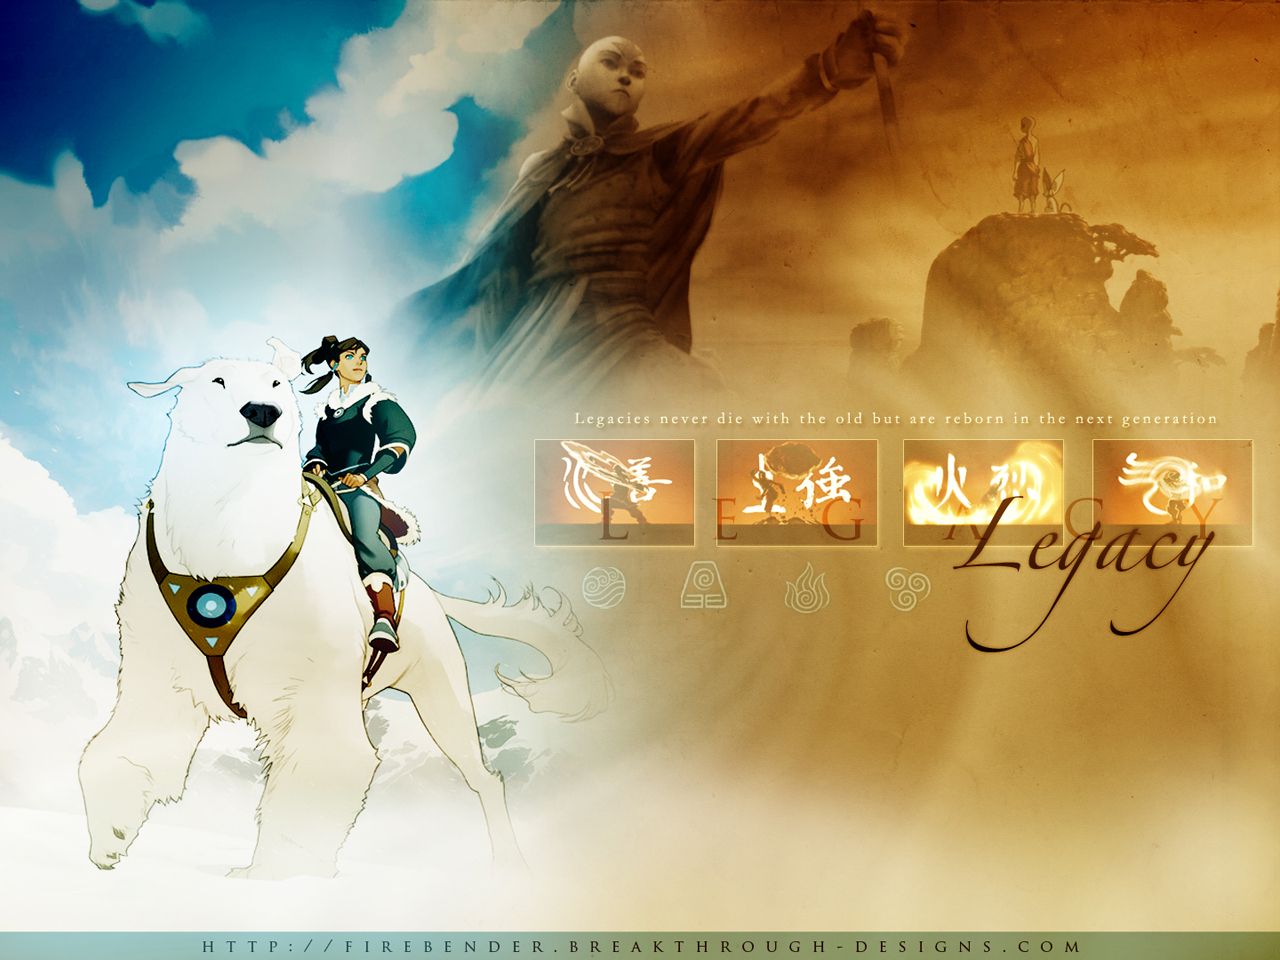 Korra wall paper avatar the legend of korra 24909444 1280 960